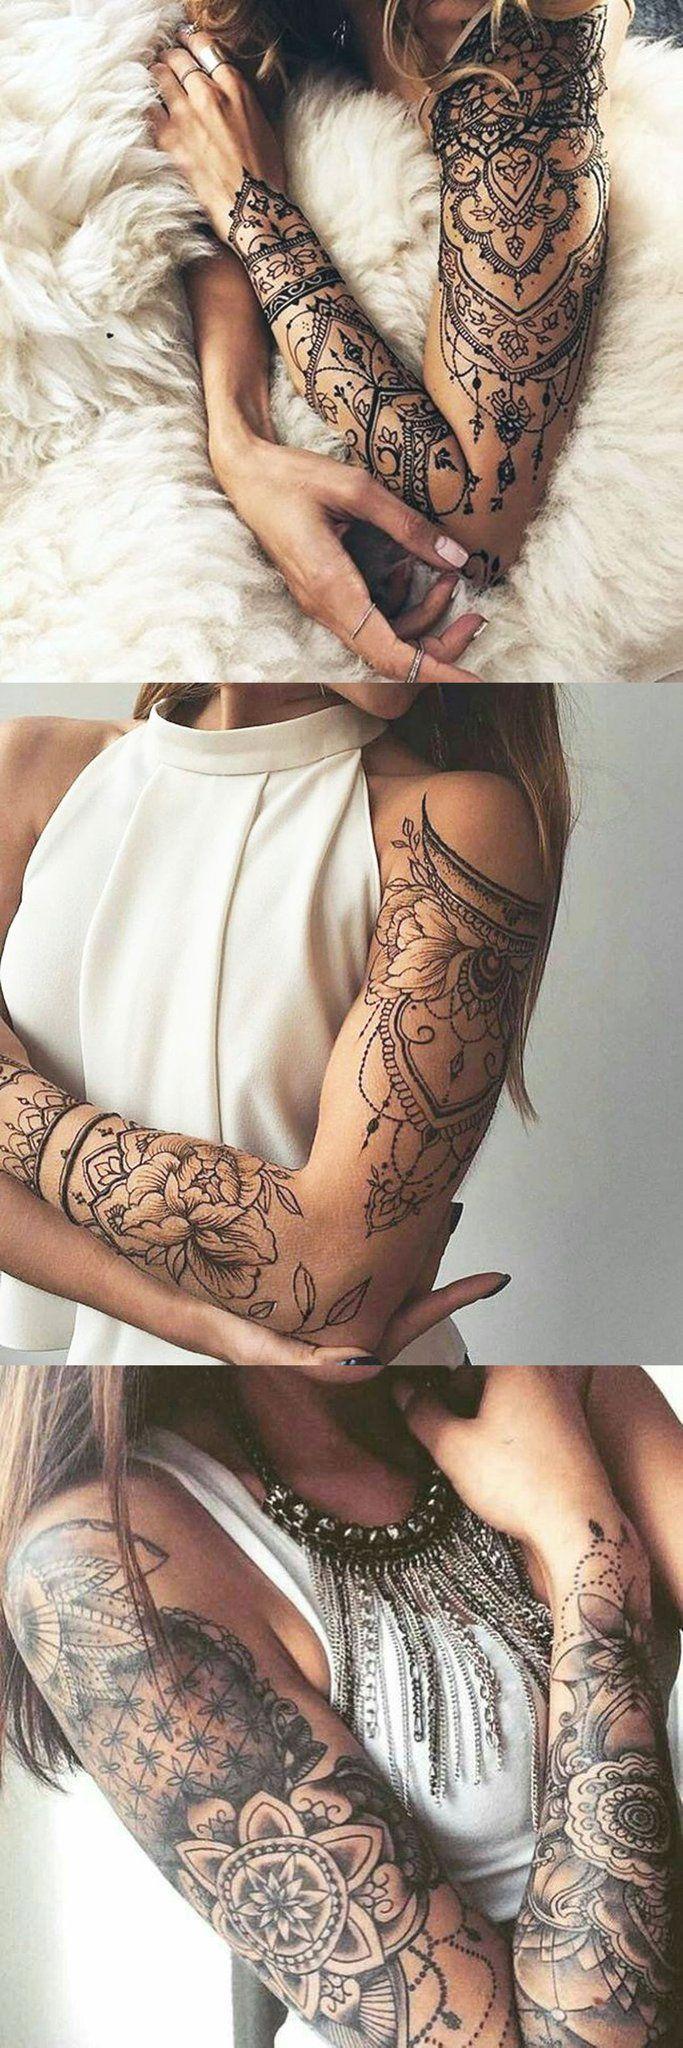 Lotus Arm Sleeve Tattoo Ideas for Women at MyBodiArt.com – Tribal Mandala Arm Bi…